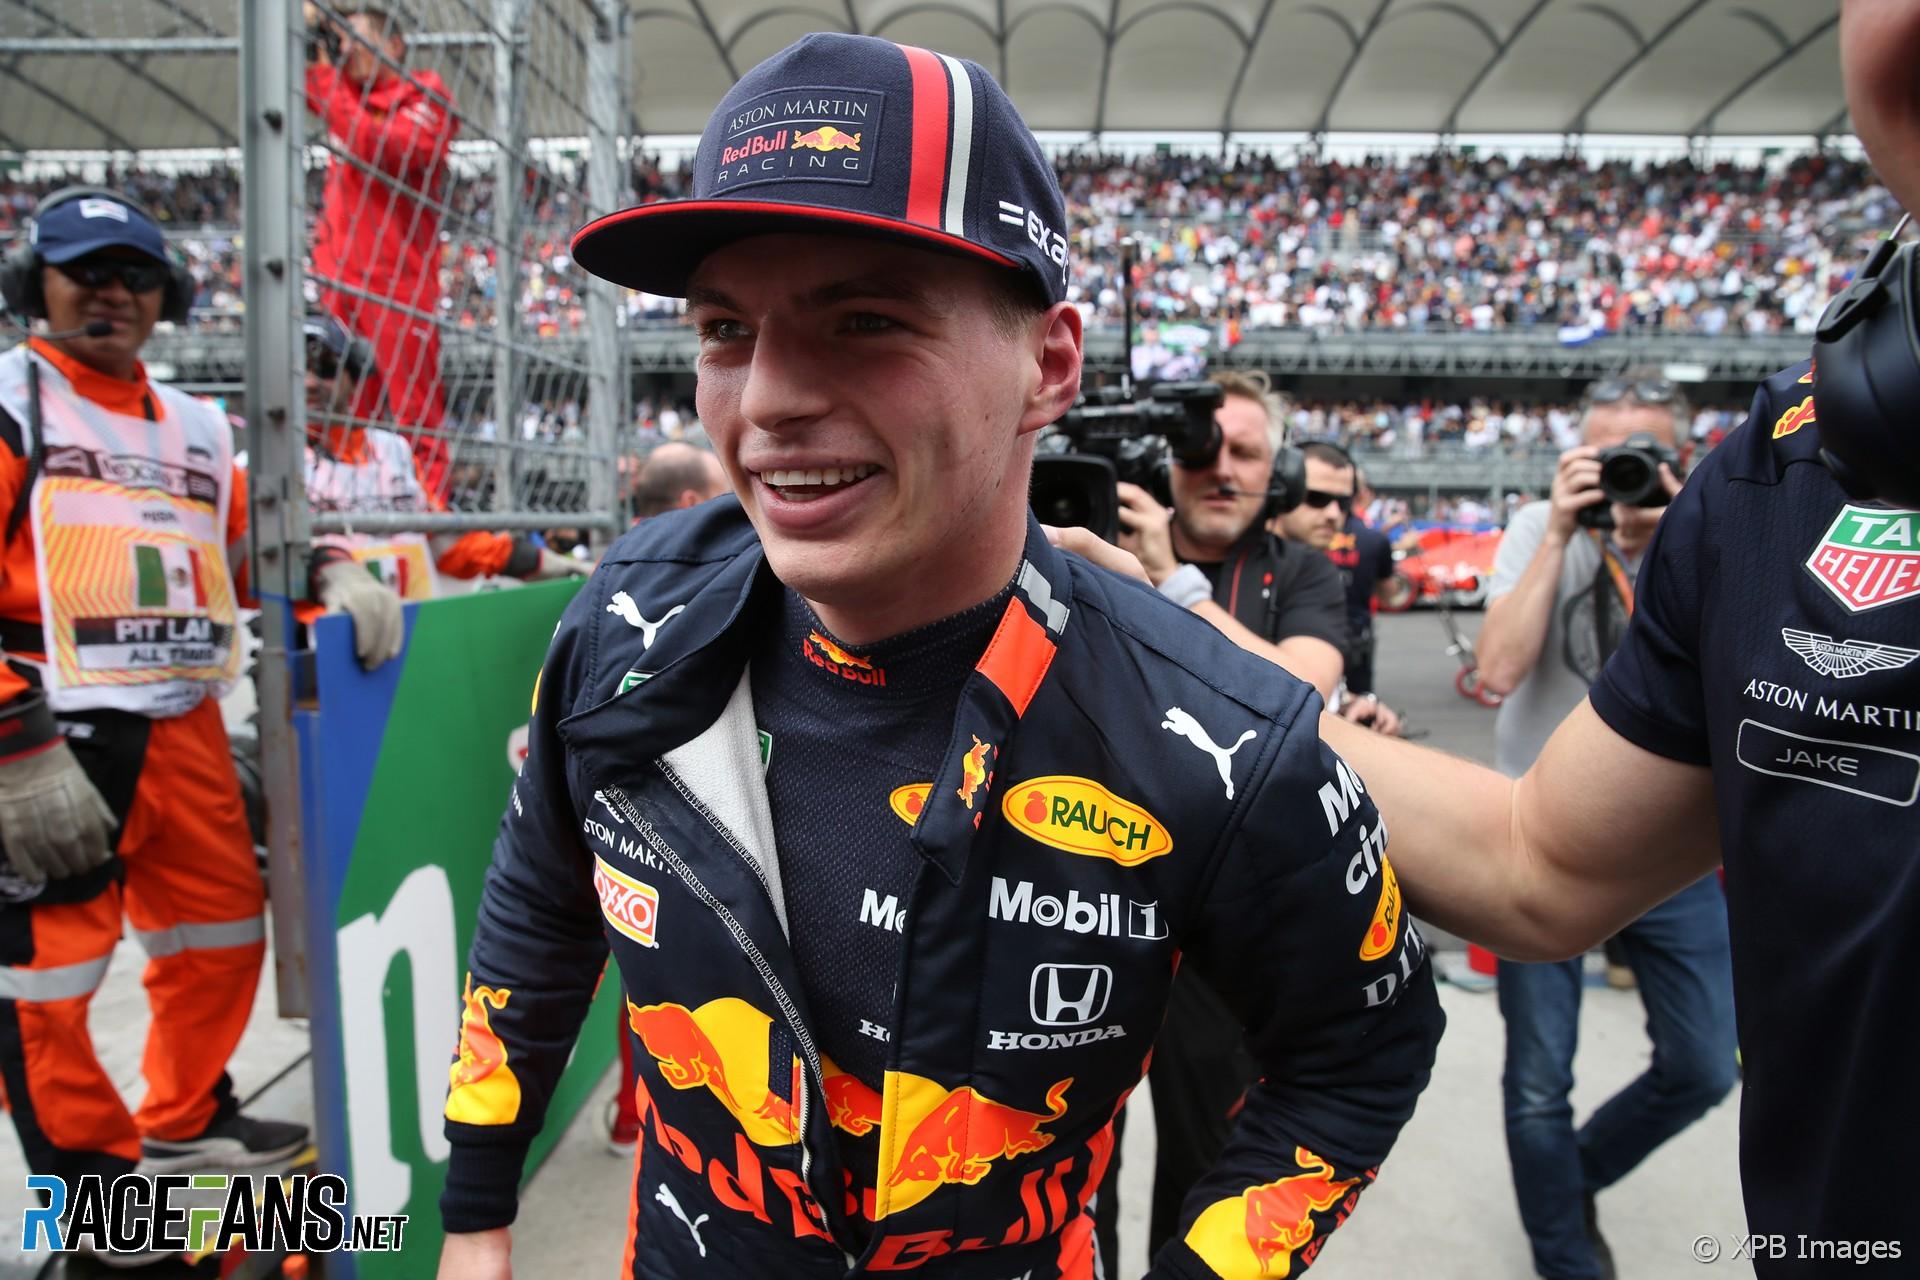 Max Verstappen, Red Bull, Autodromo Hermanos Rodriguez, 2019